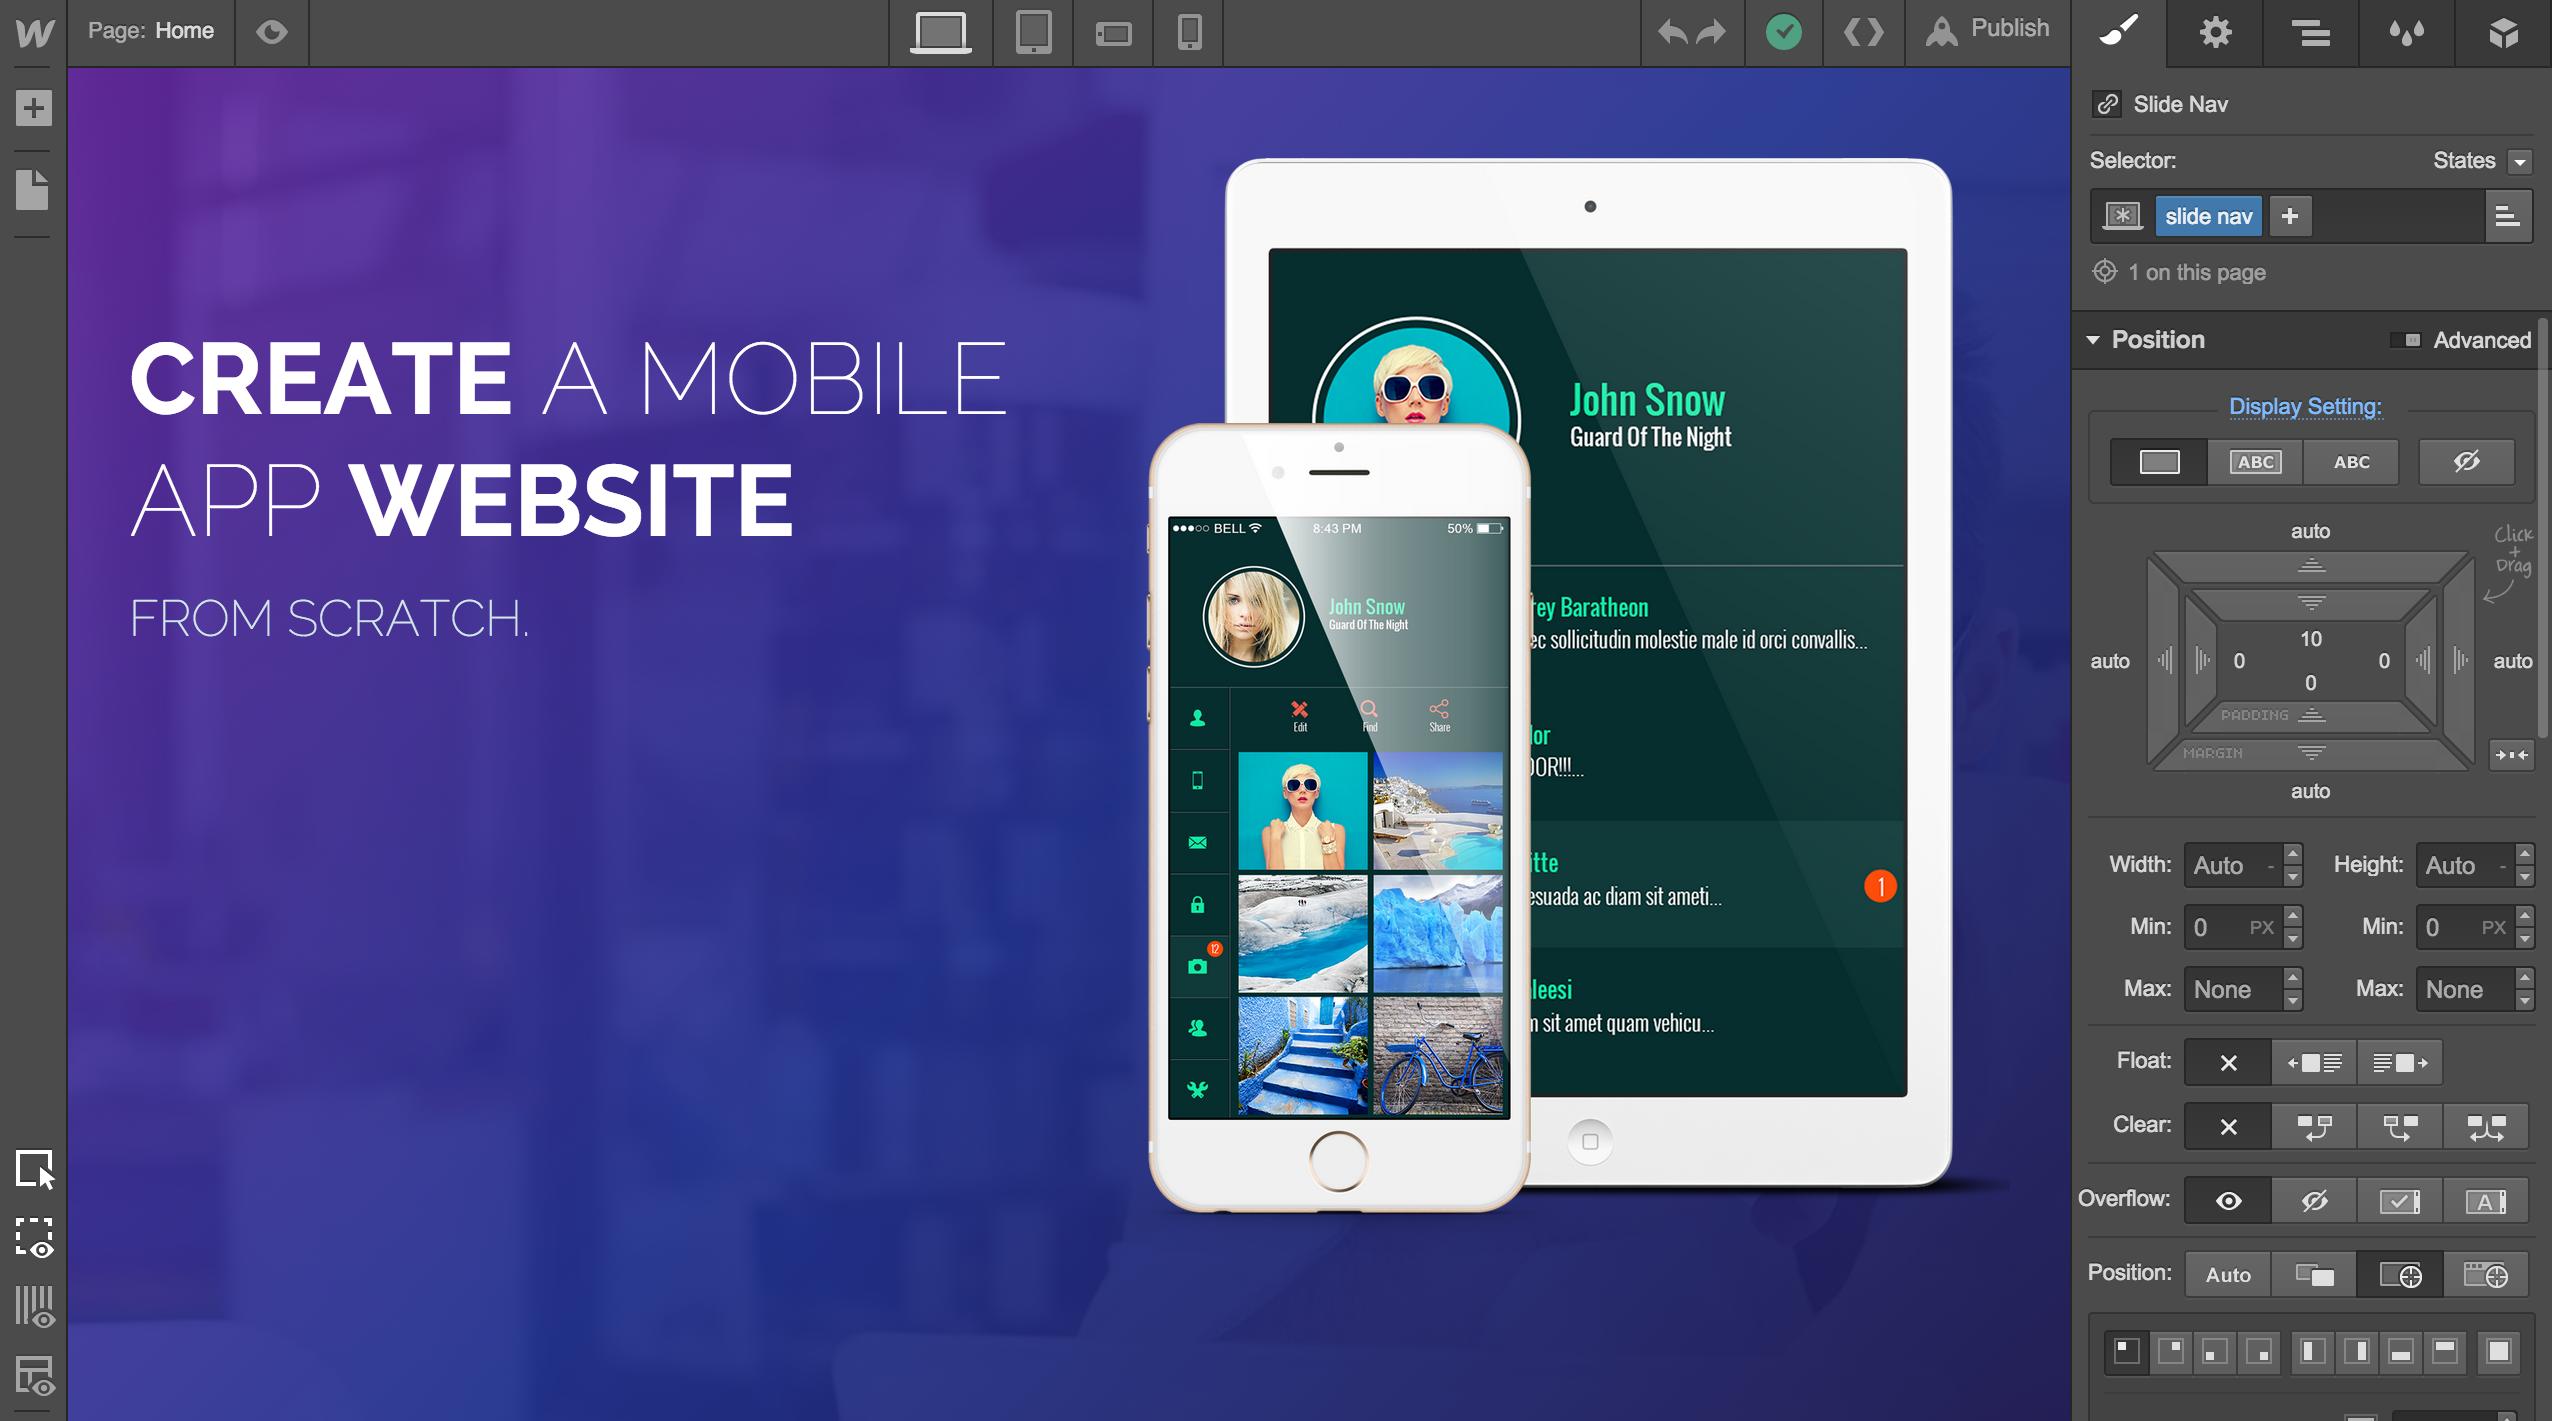 Webflow screenshot: In the Designer